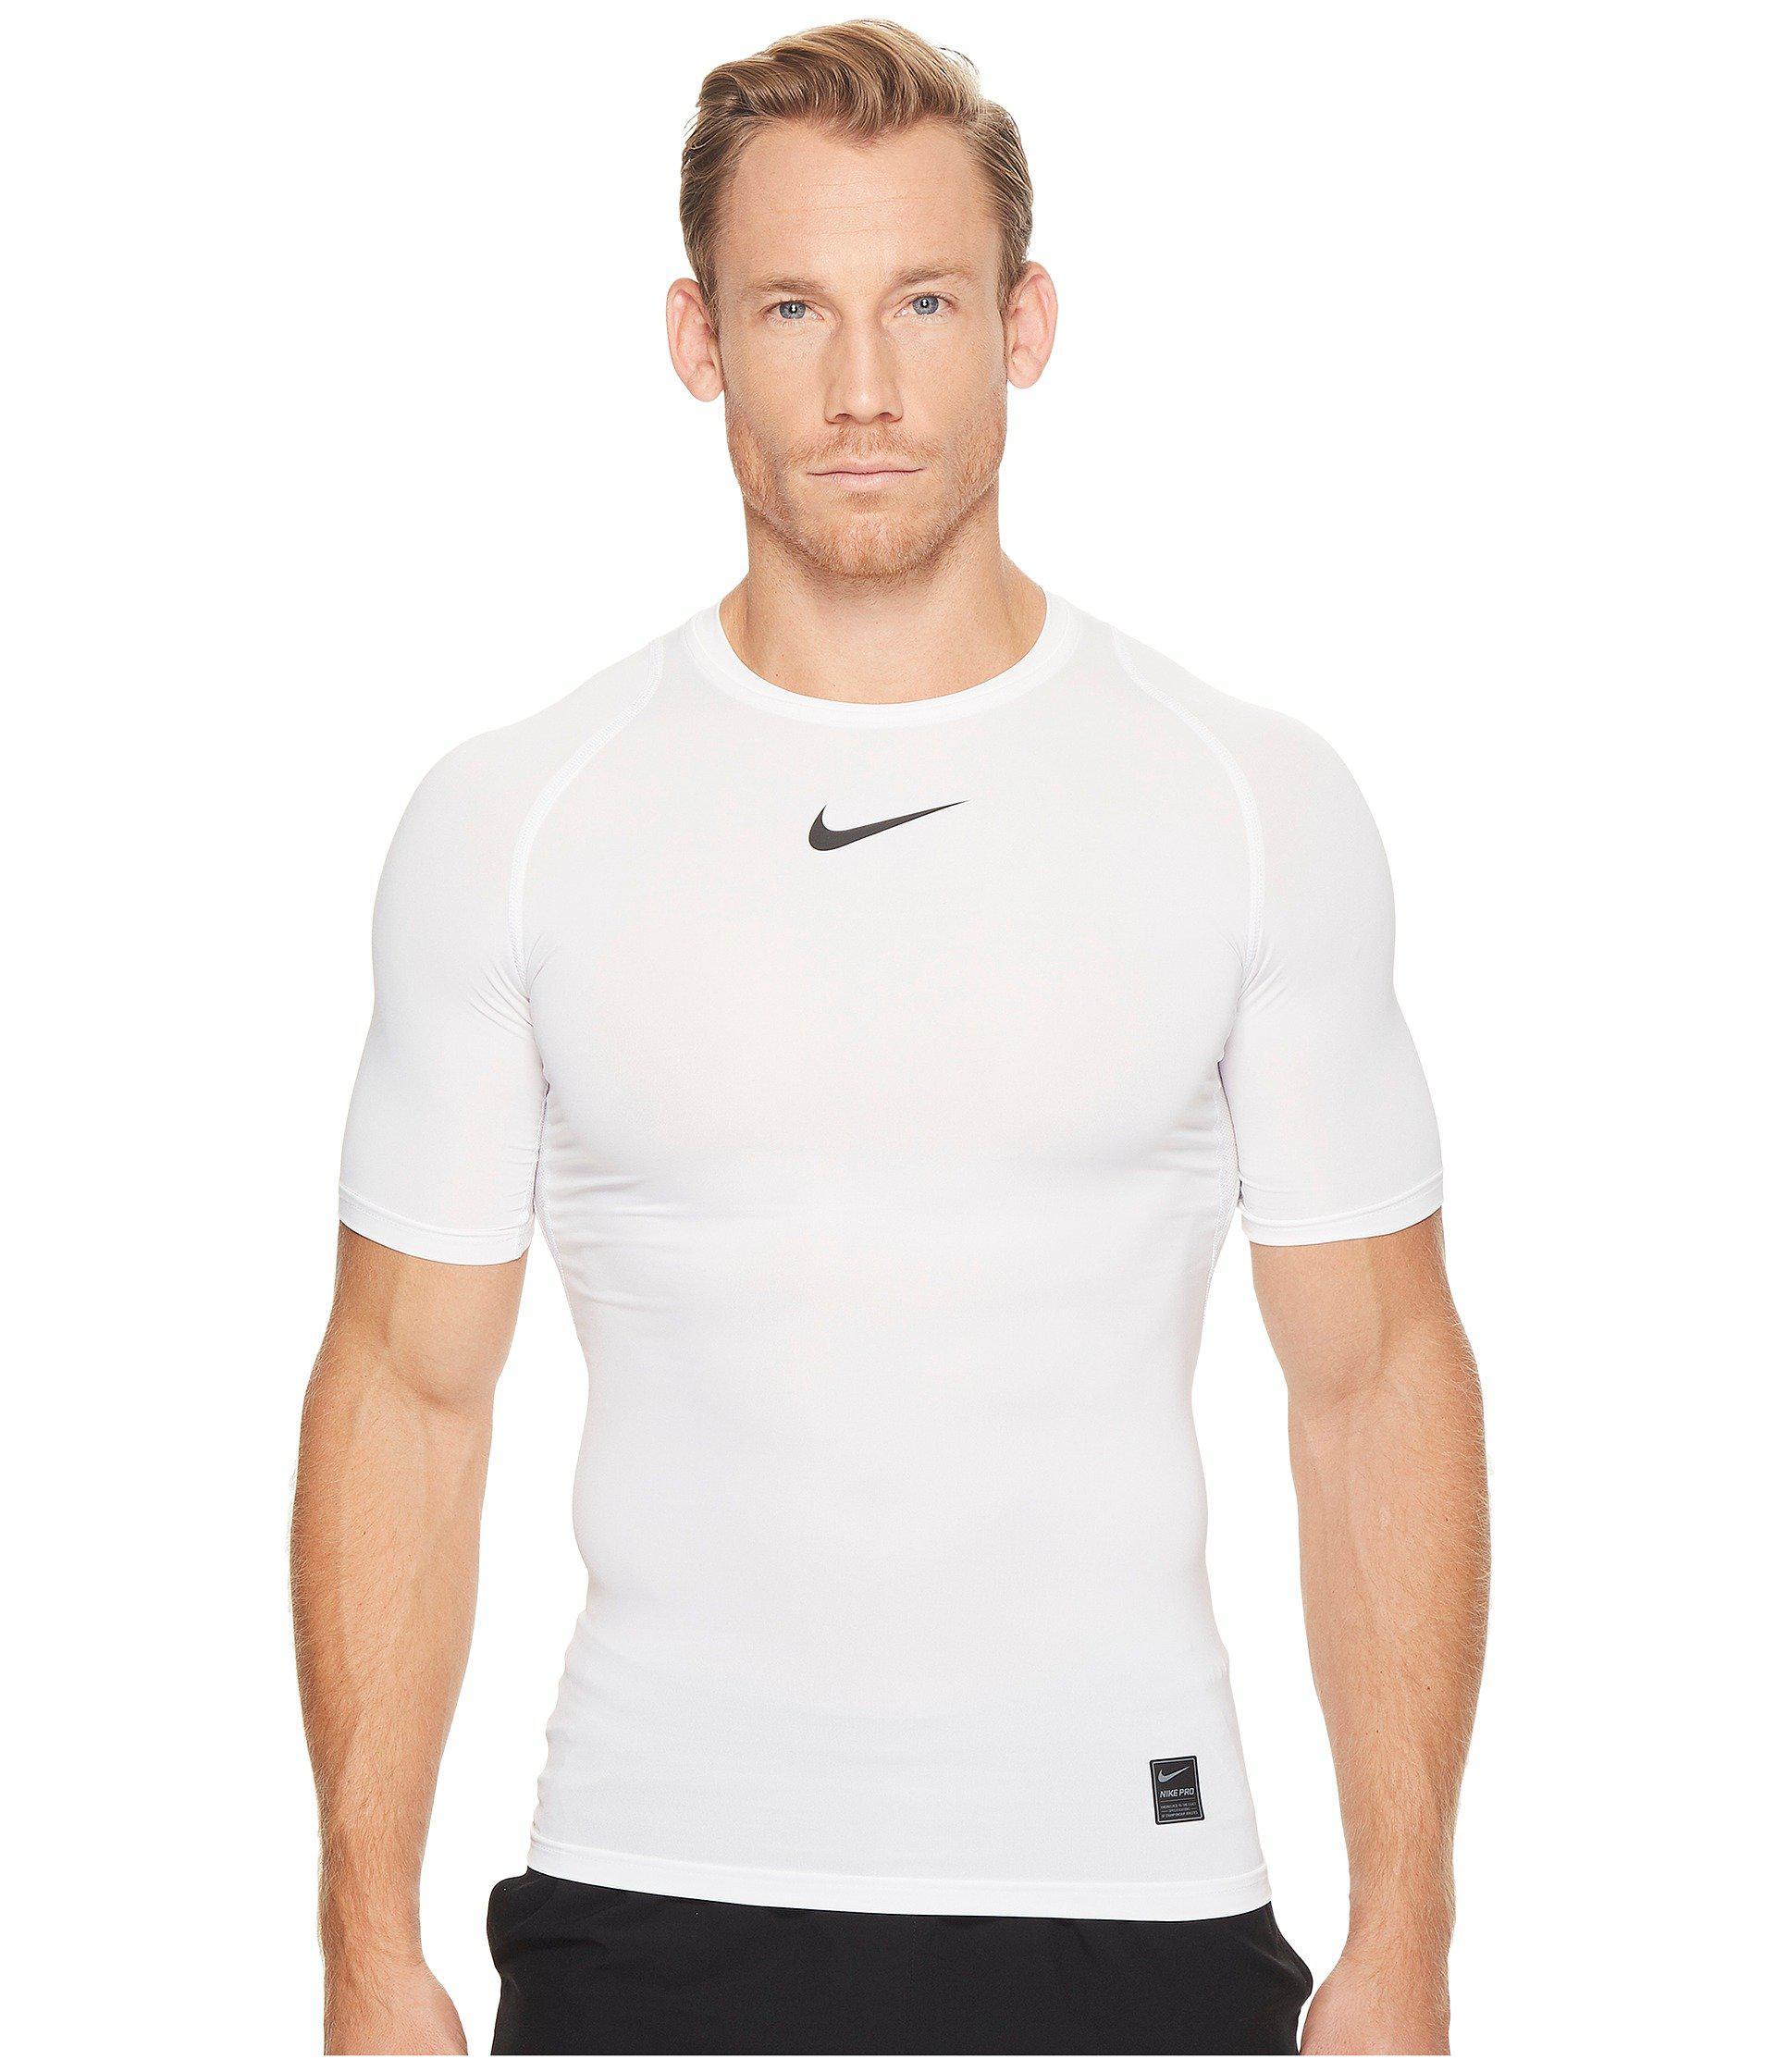 76d76cbd Nike. Pro Compression Short Sleeve Training Top (black/white/white) Men's  ...